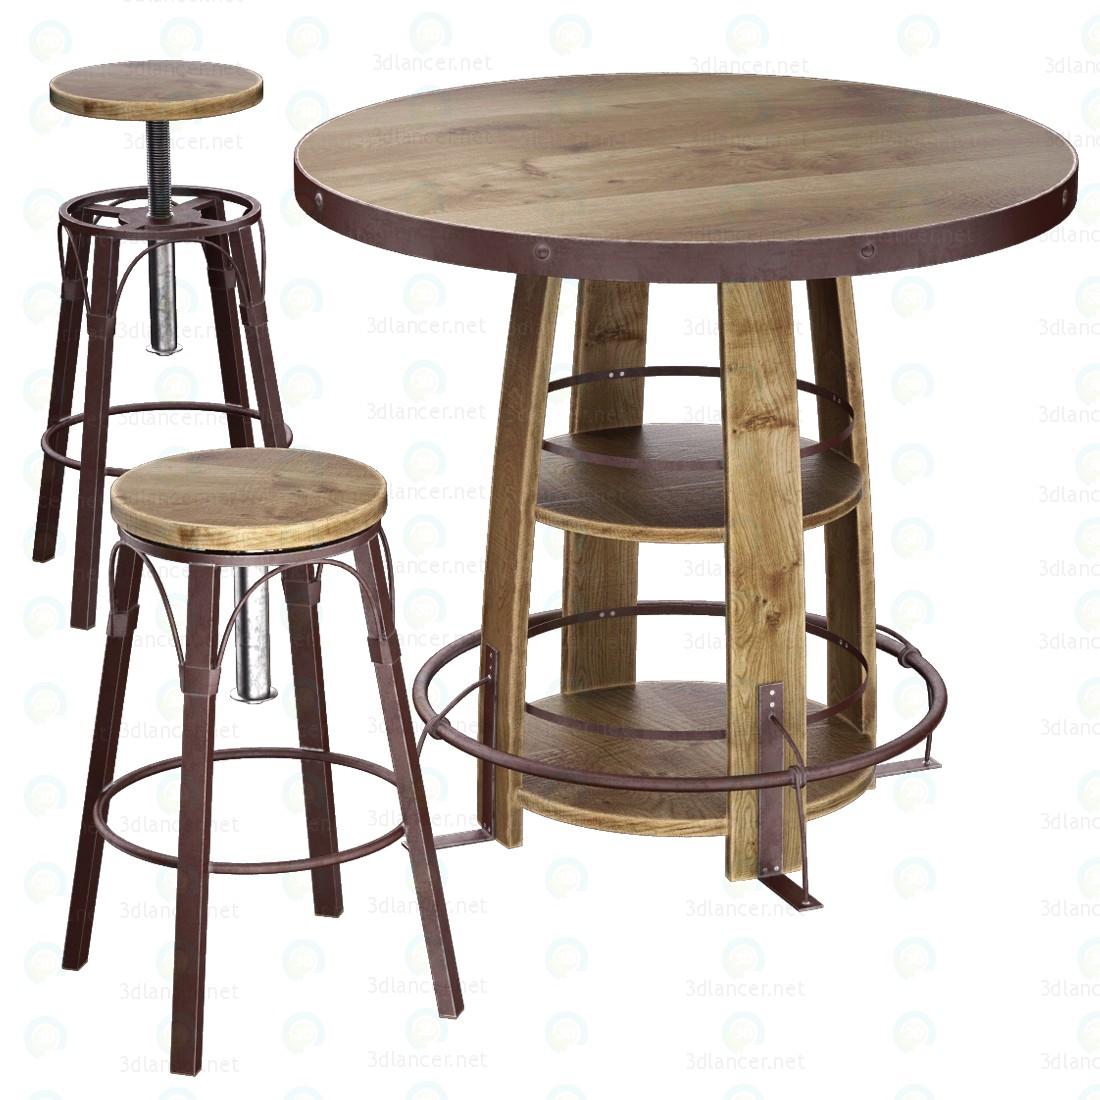 3d Bayshore Pub Table Set модель купити - зображення